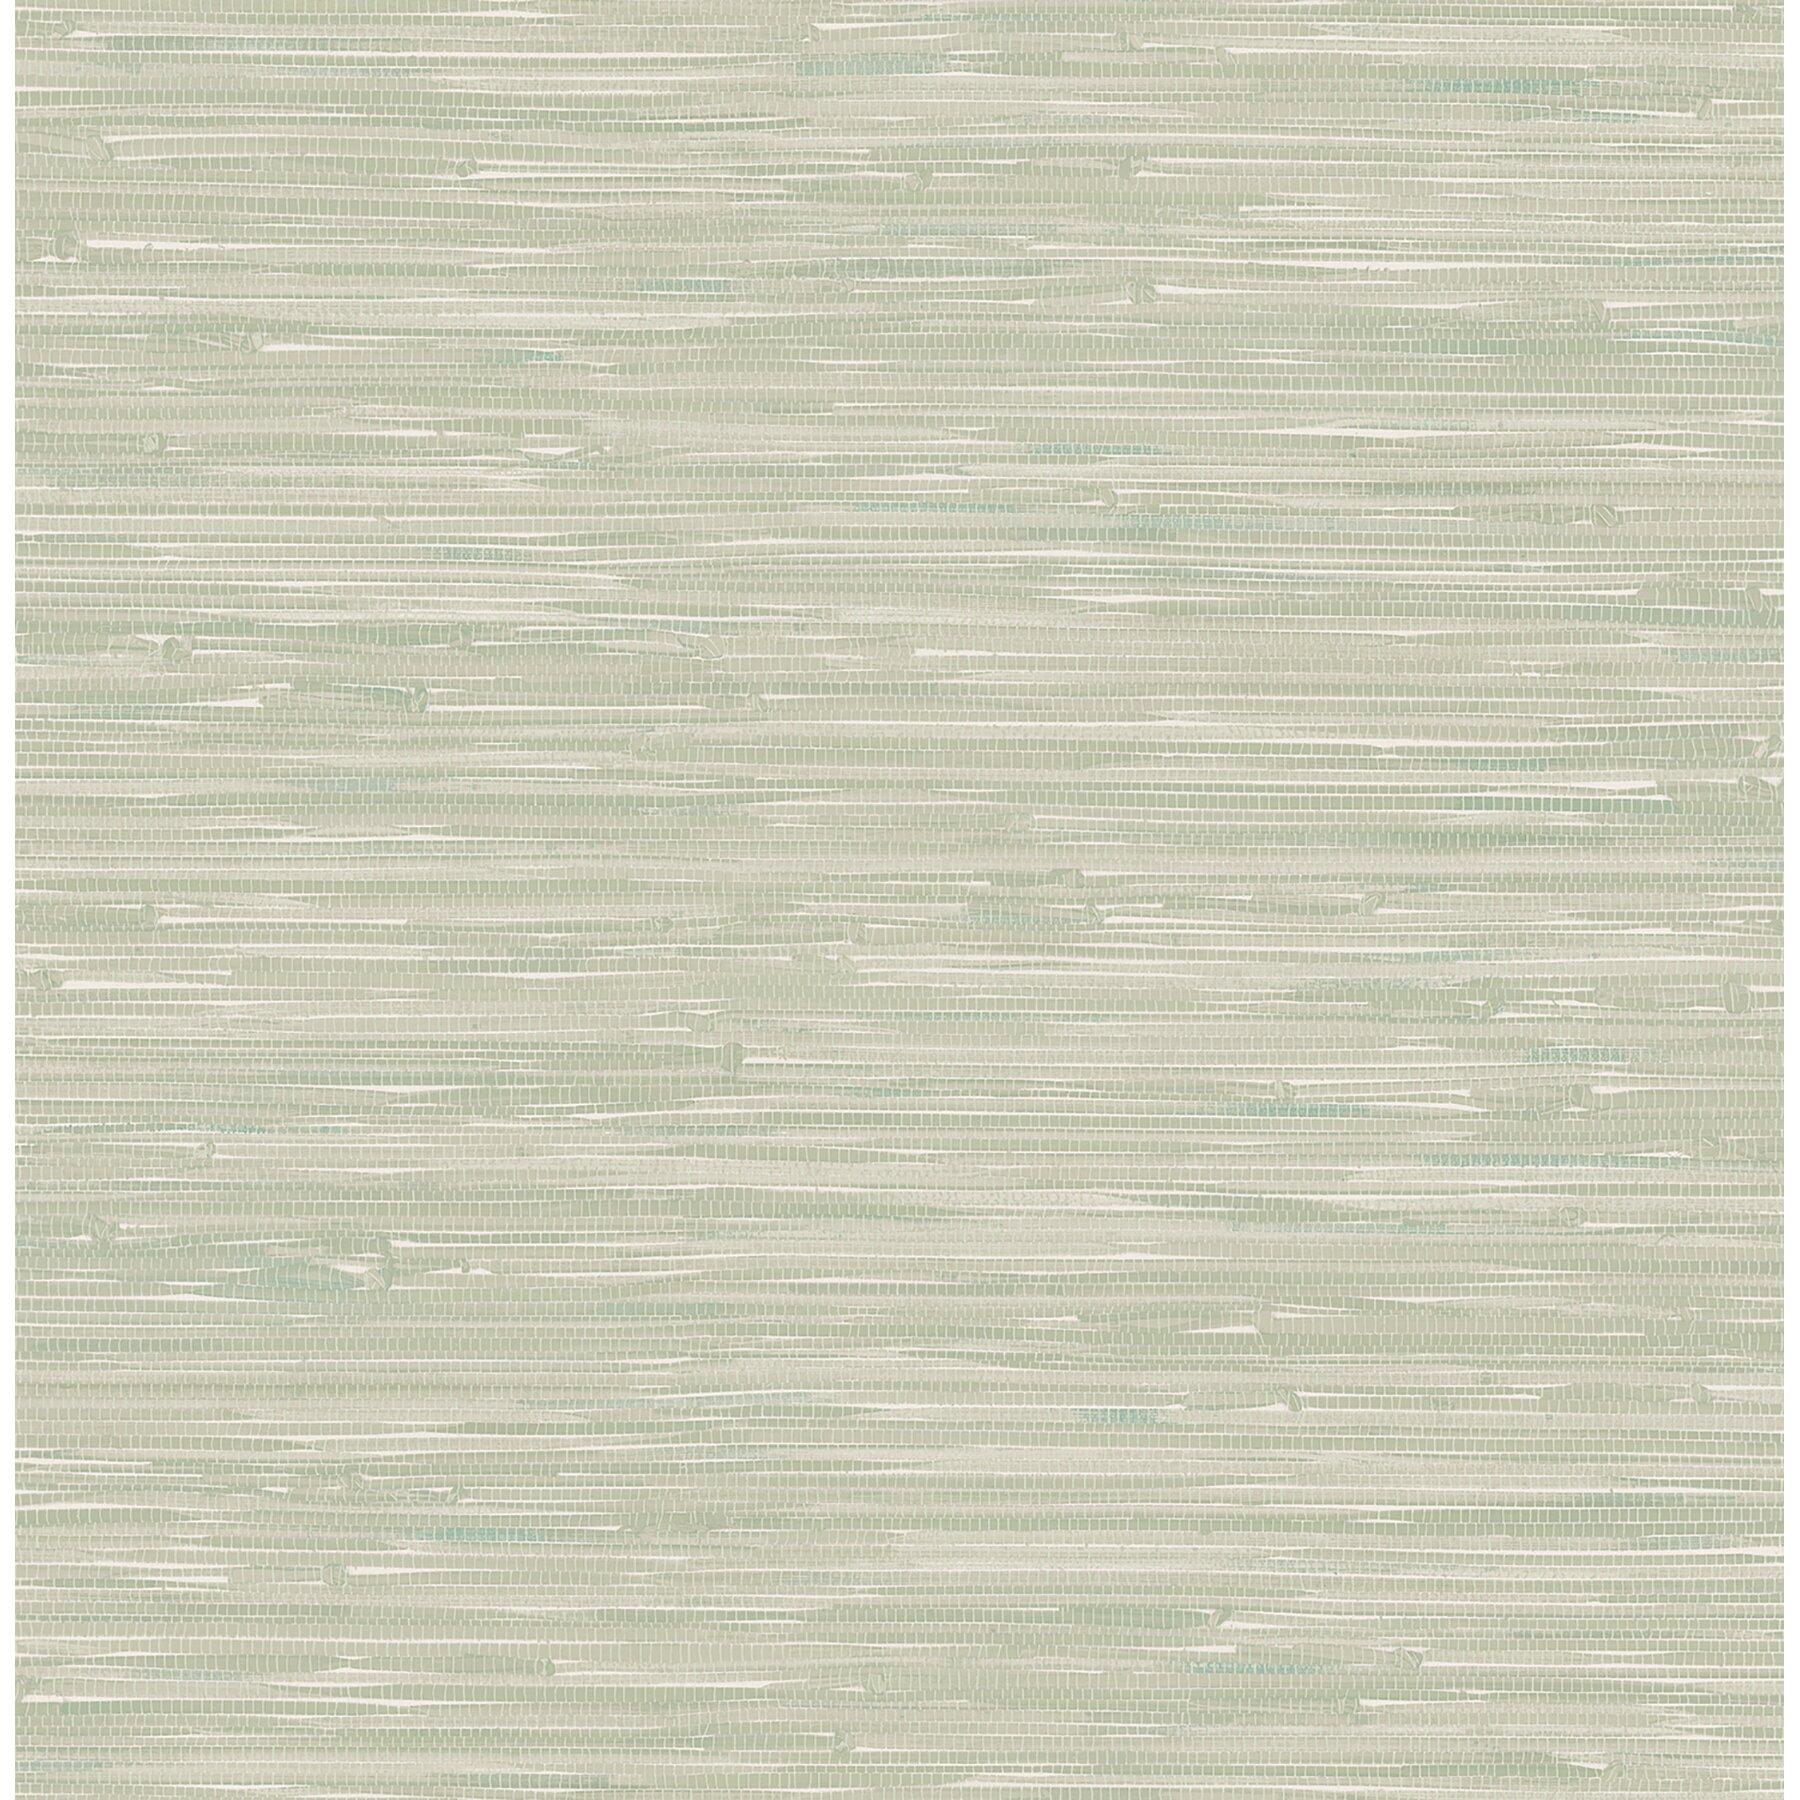 Modern Wallpaper Sage Green Metallic Faux Grasscloth: Brewster Home Fashions Ami Natalie Faux Grasscloth 33' X